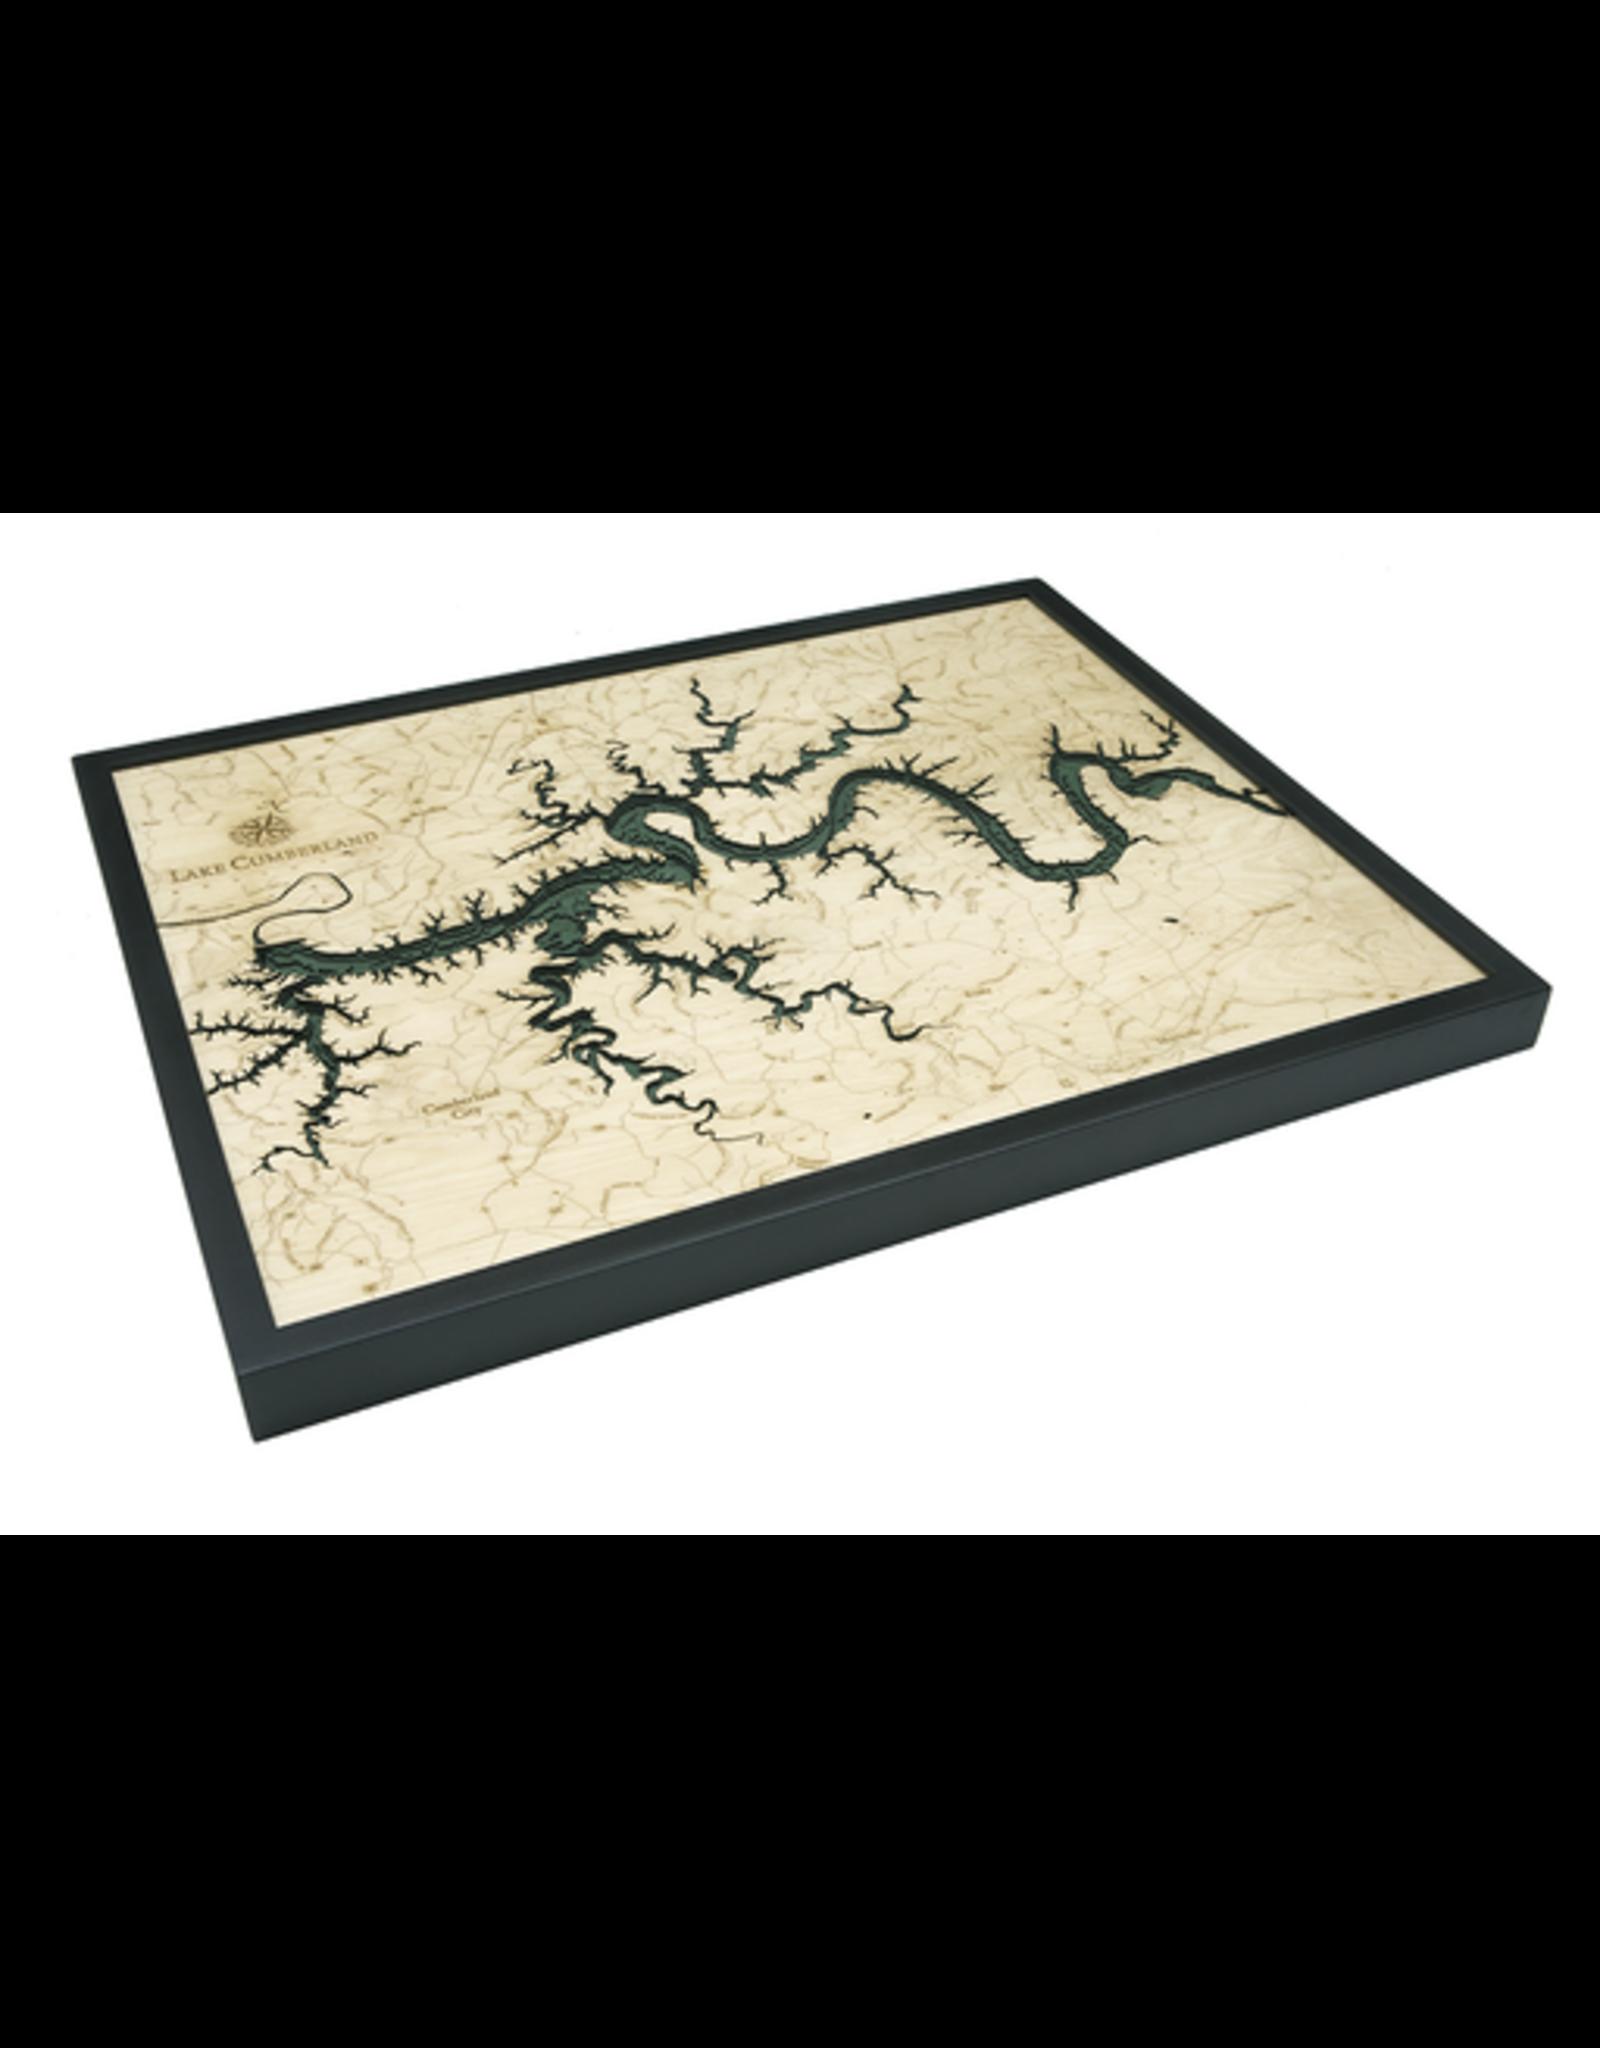 WoodCharts Lake Cumberland, KY (Bathymetric 3-D Wood Carved Nautical Chart)